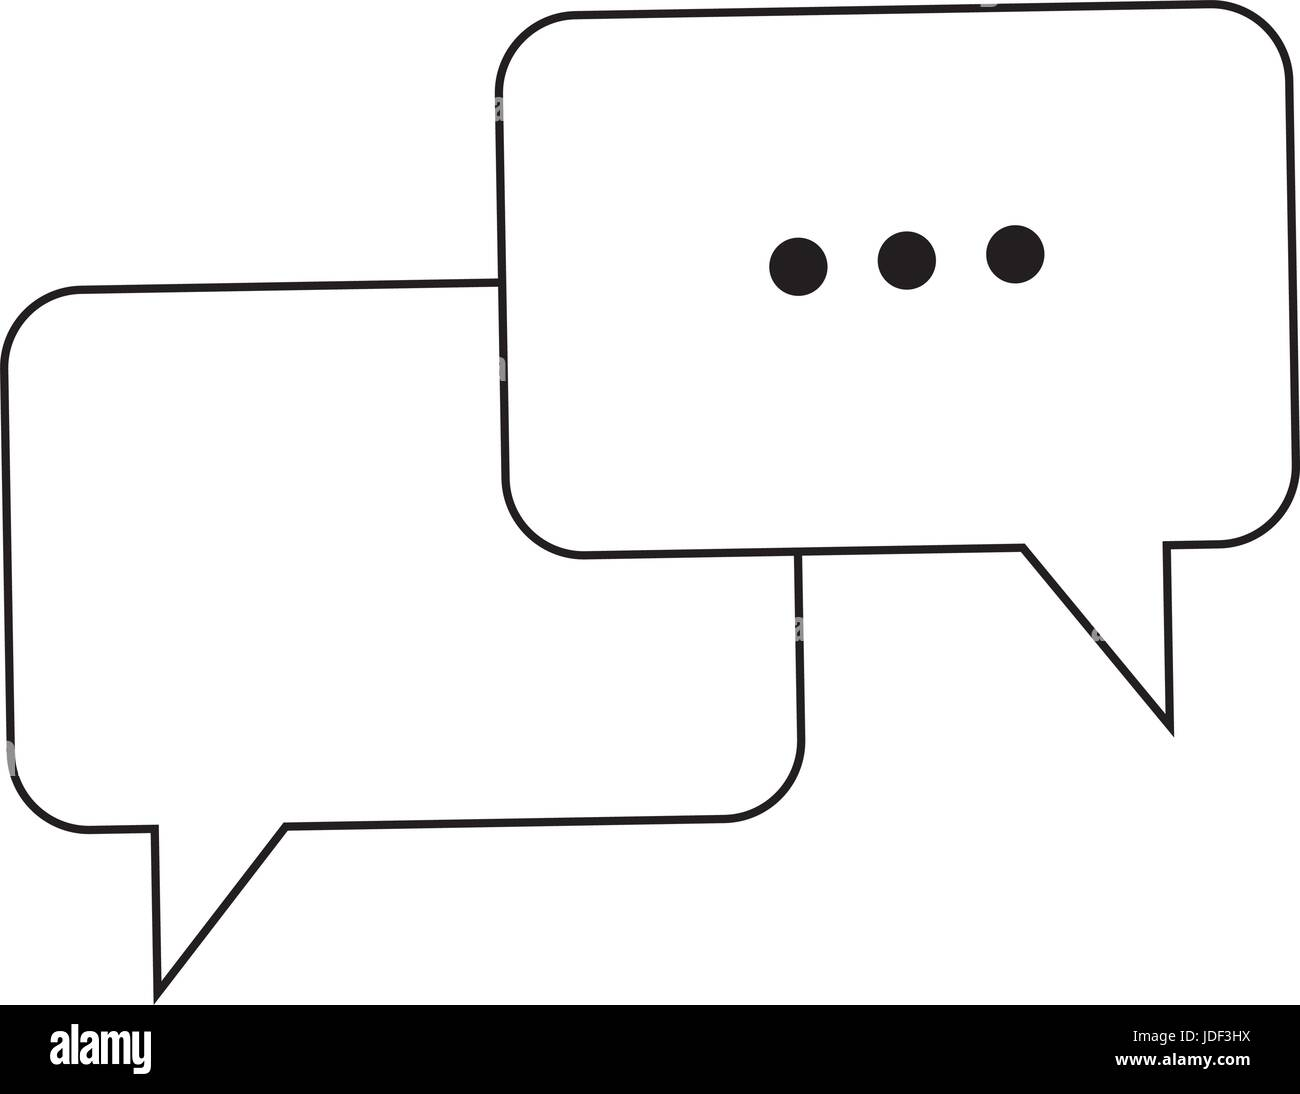 Bubble speech talk message communication web app stock vector art bubble speech talk message communication web app ccuart Images